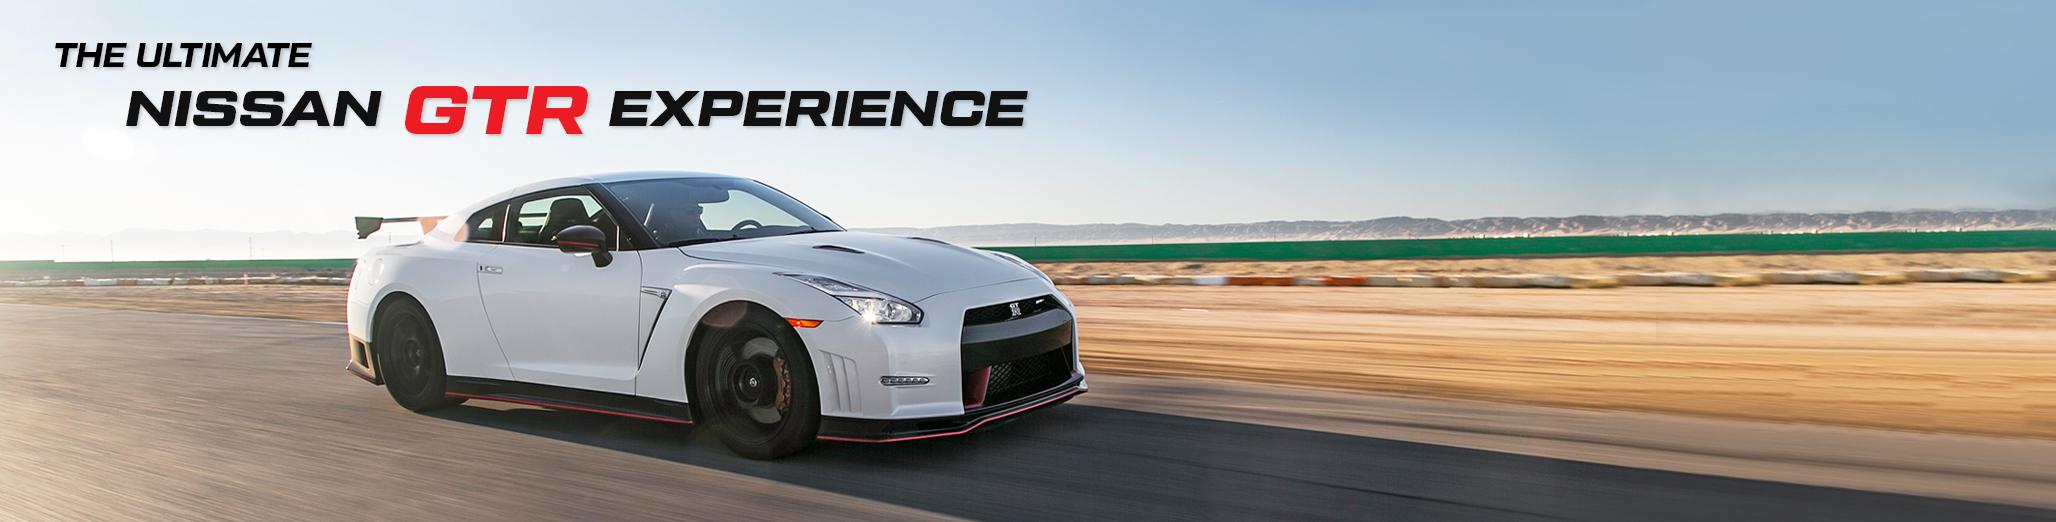 Nissan GTR Supercar Experience Banner